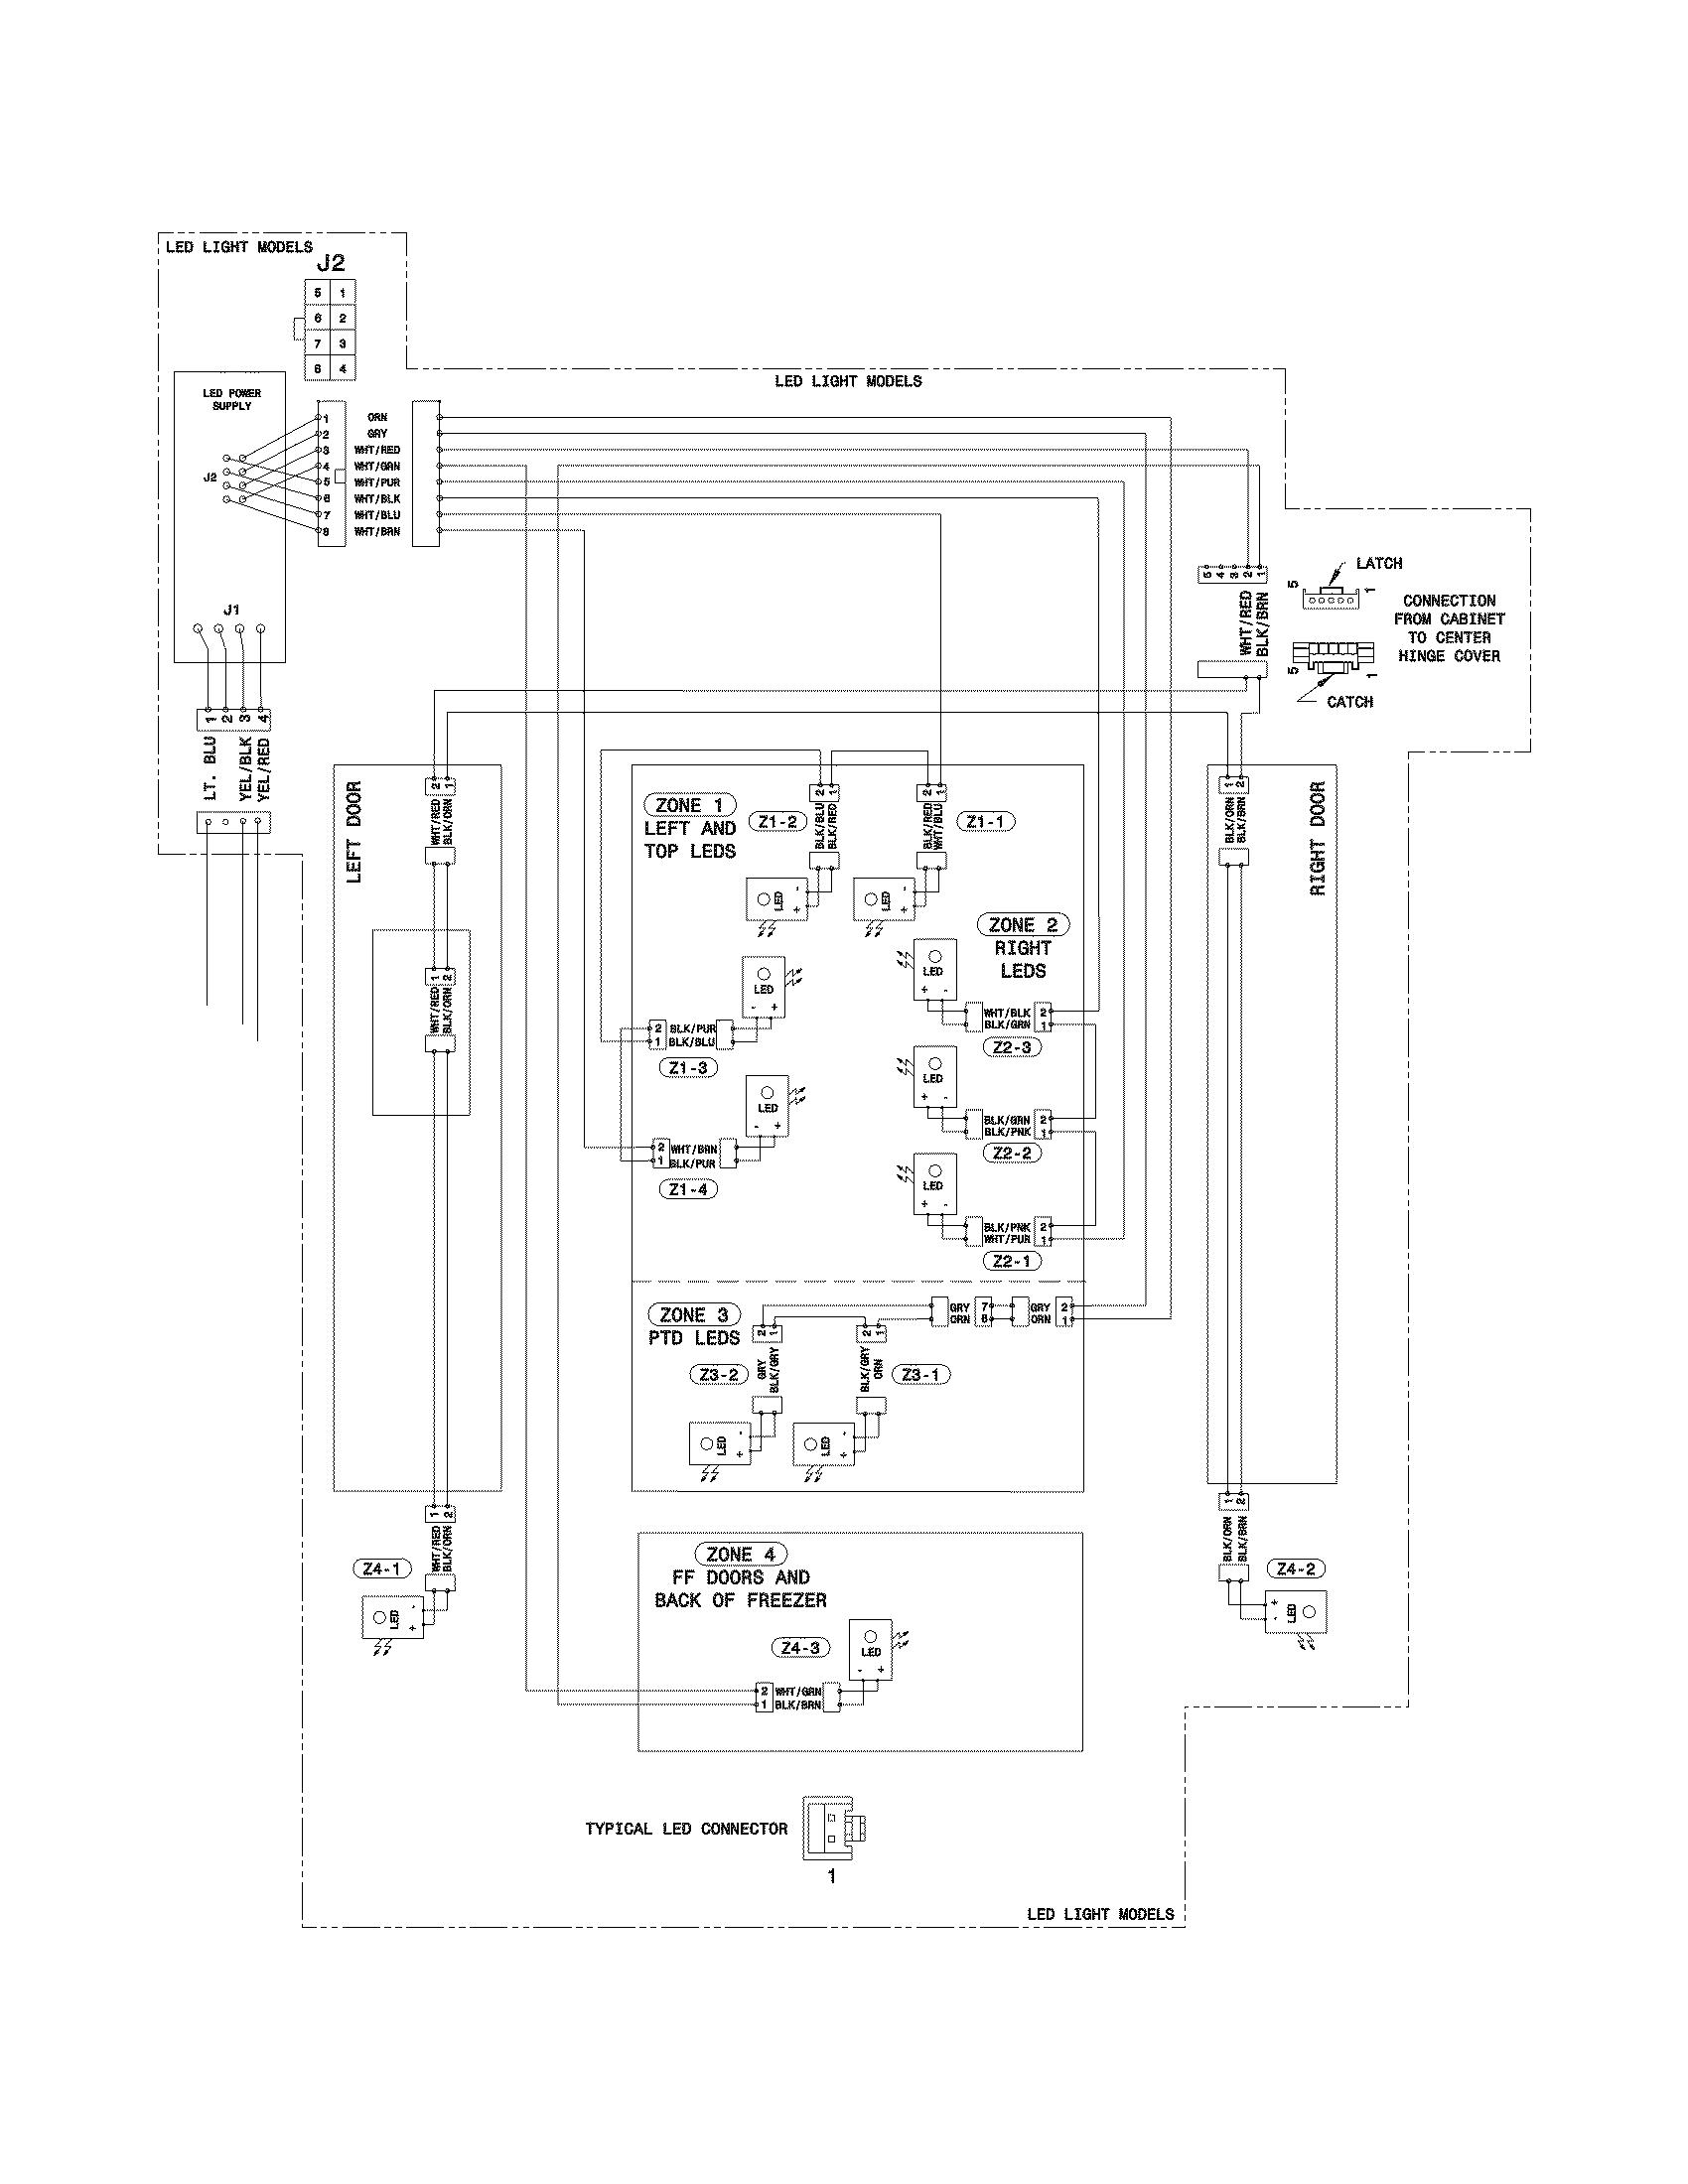 Electrolux ewf10470w wiring diagram service manual 1st page electrolux ewf10470w wiring diagram service manual download rh elektrotanya